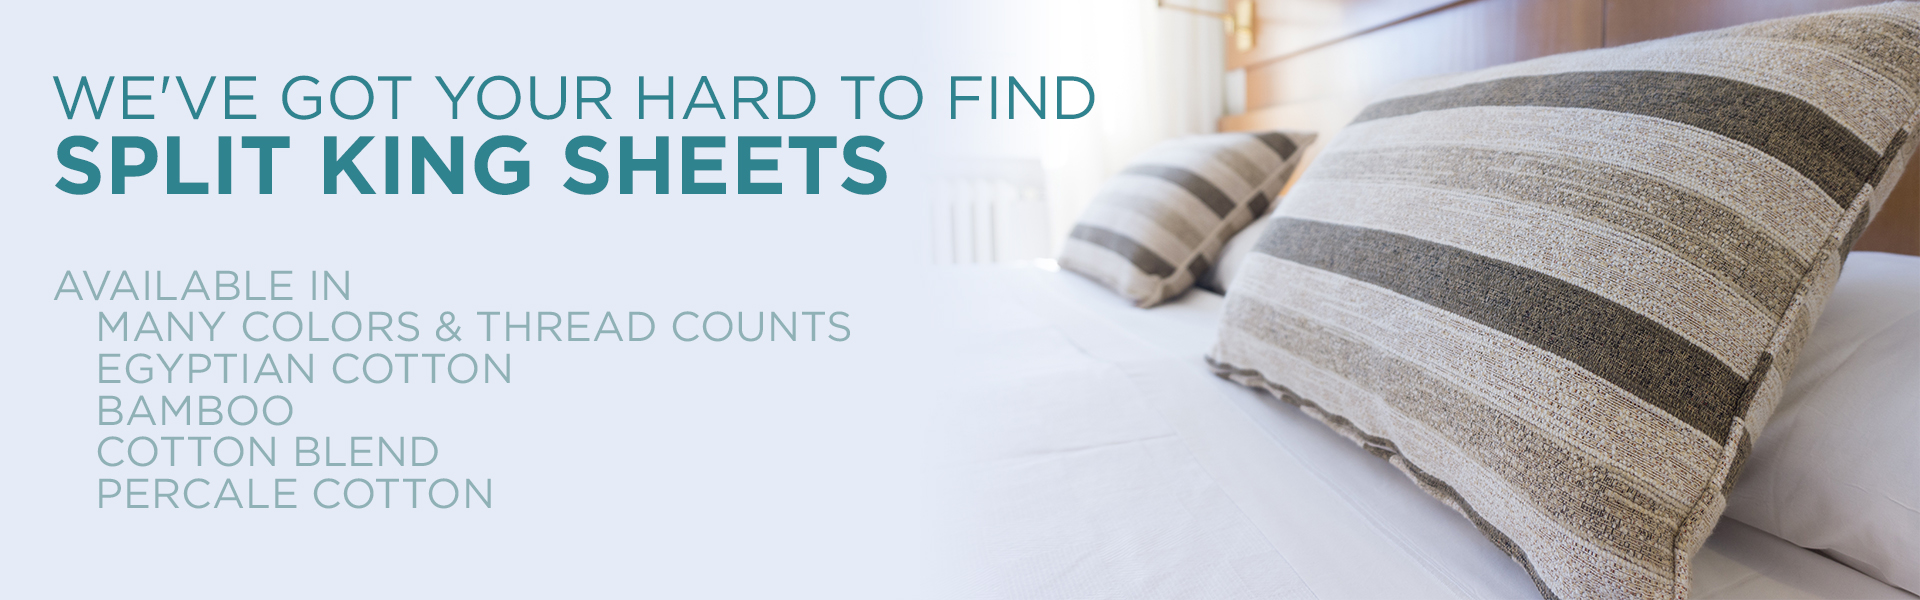 Split King Sheets, 100% Egyptian Cotton Bedding, 900 GSM Towels, Dual King  Sheets